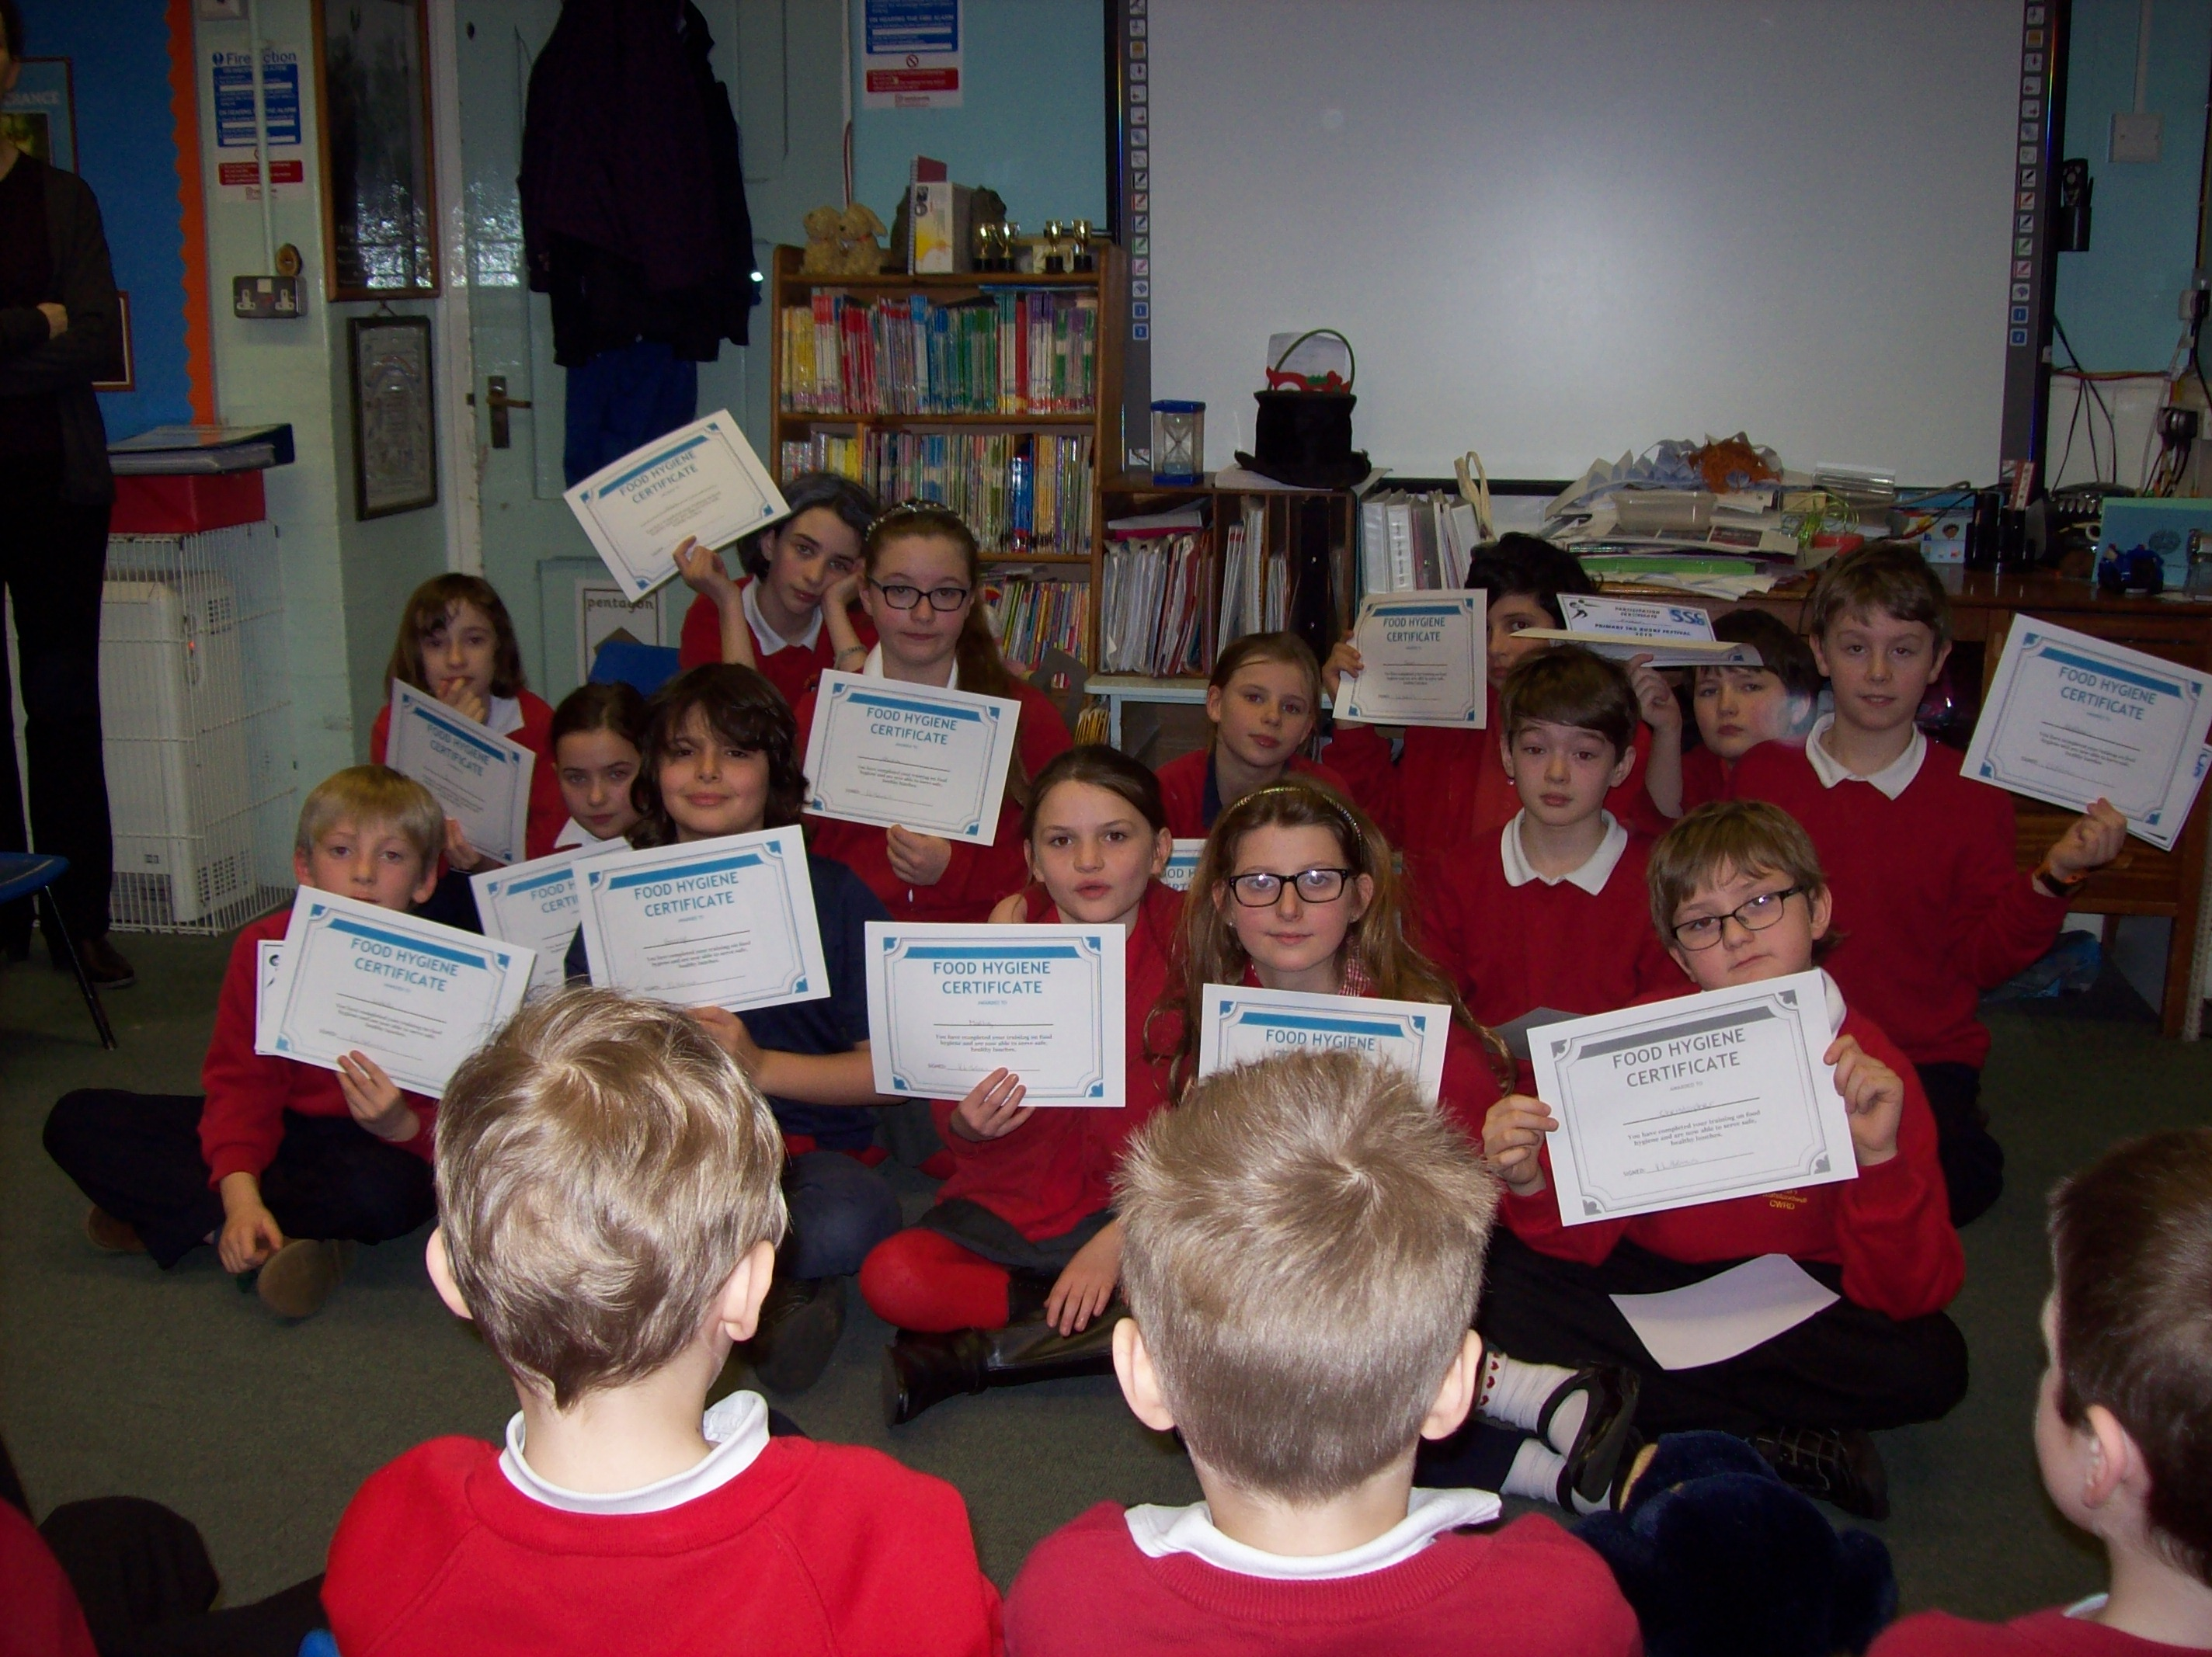 Food hygiene certificates